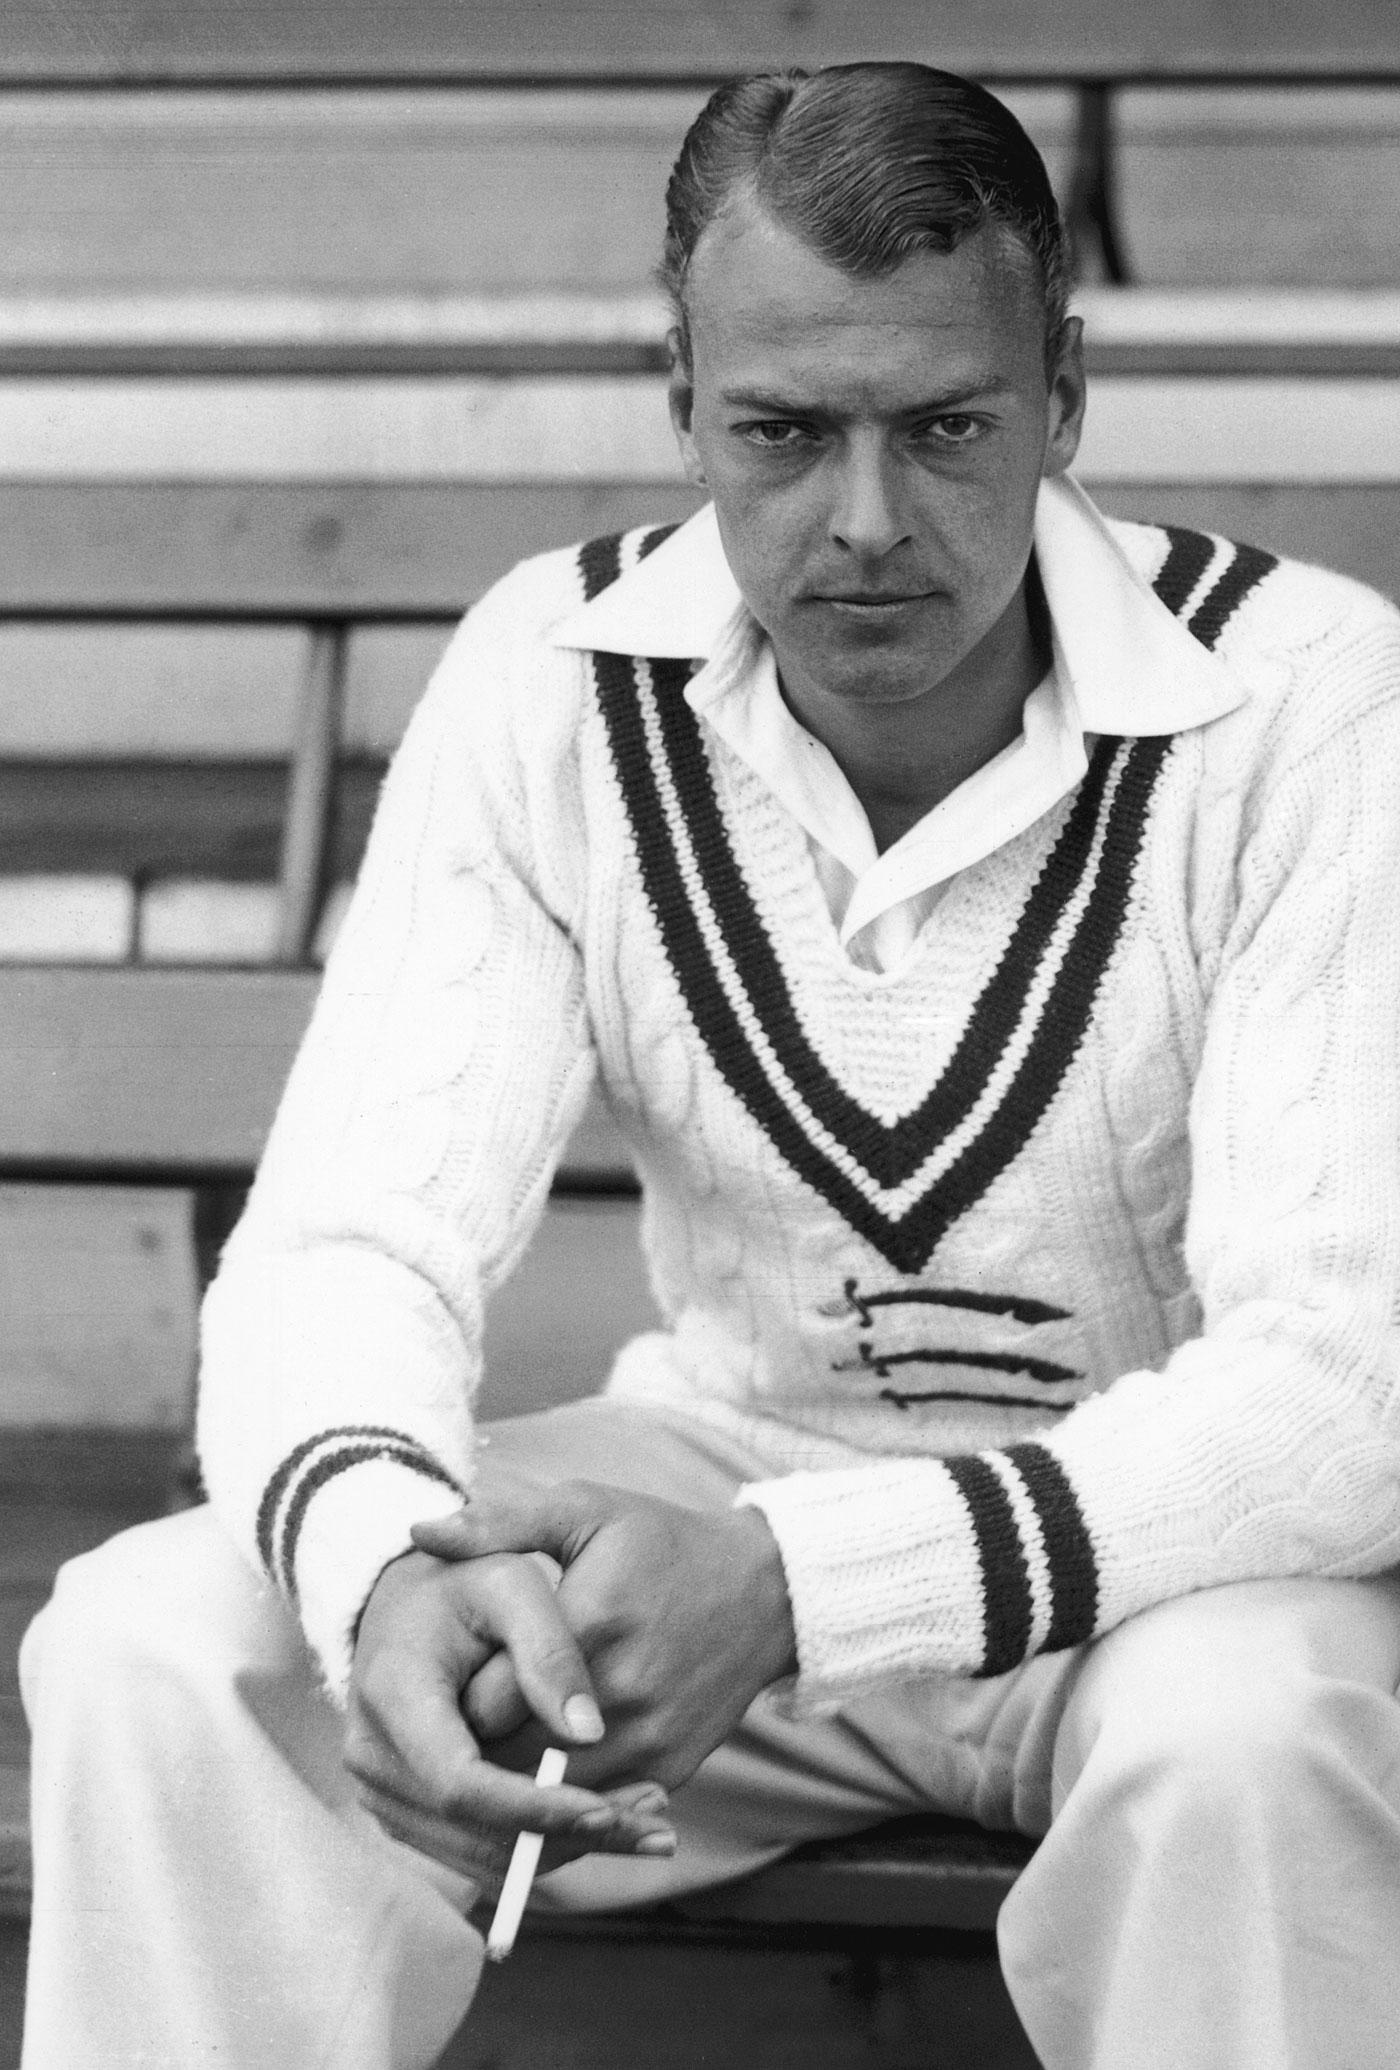 The England spinner Ian Peebles, Faulkner's protégé, whose progress Faulkner kept track of even during his darkest days